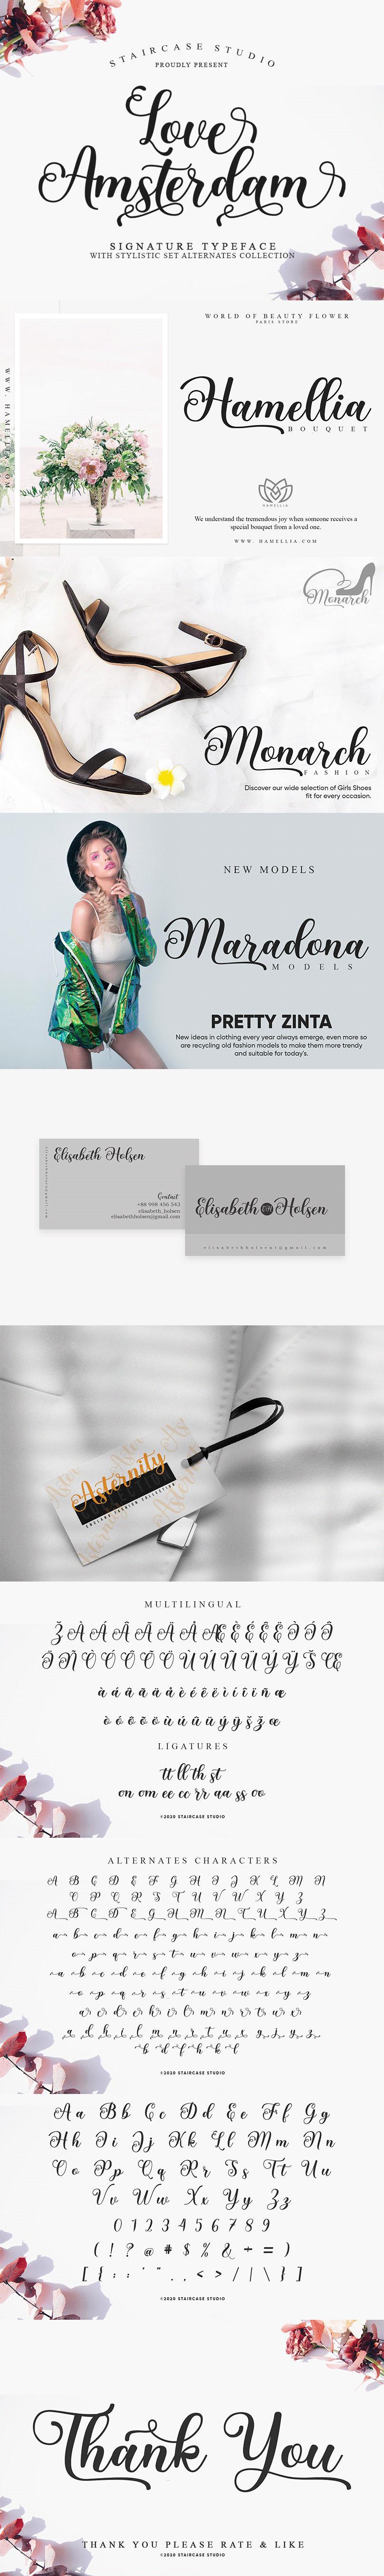 branding  decorative fonts Logotype love amsterdam Script signature Typeface